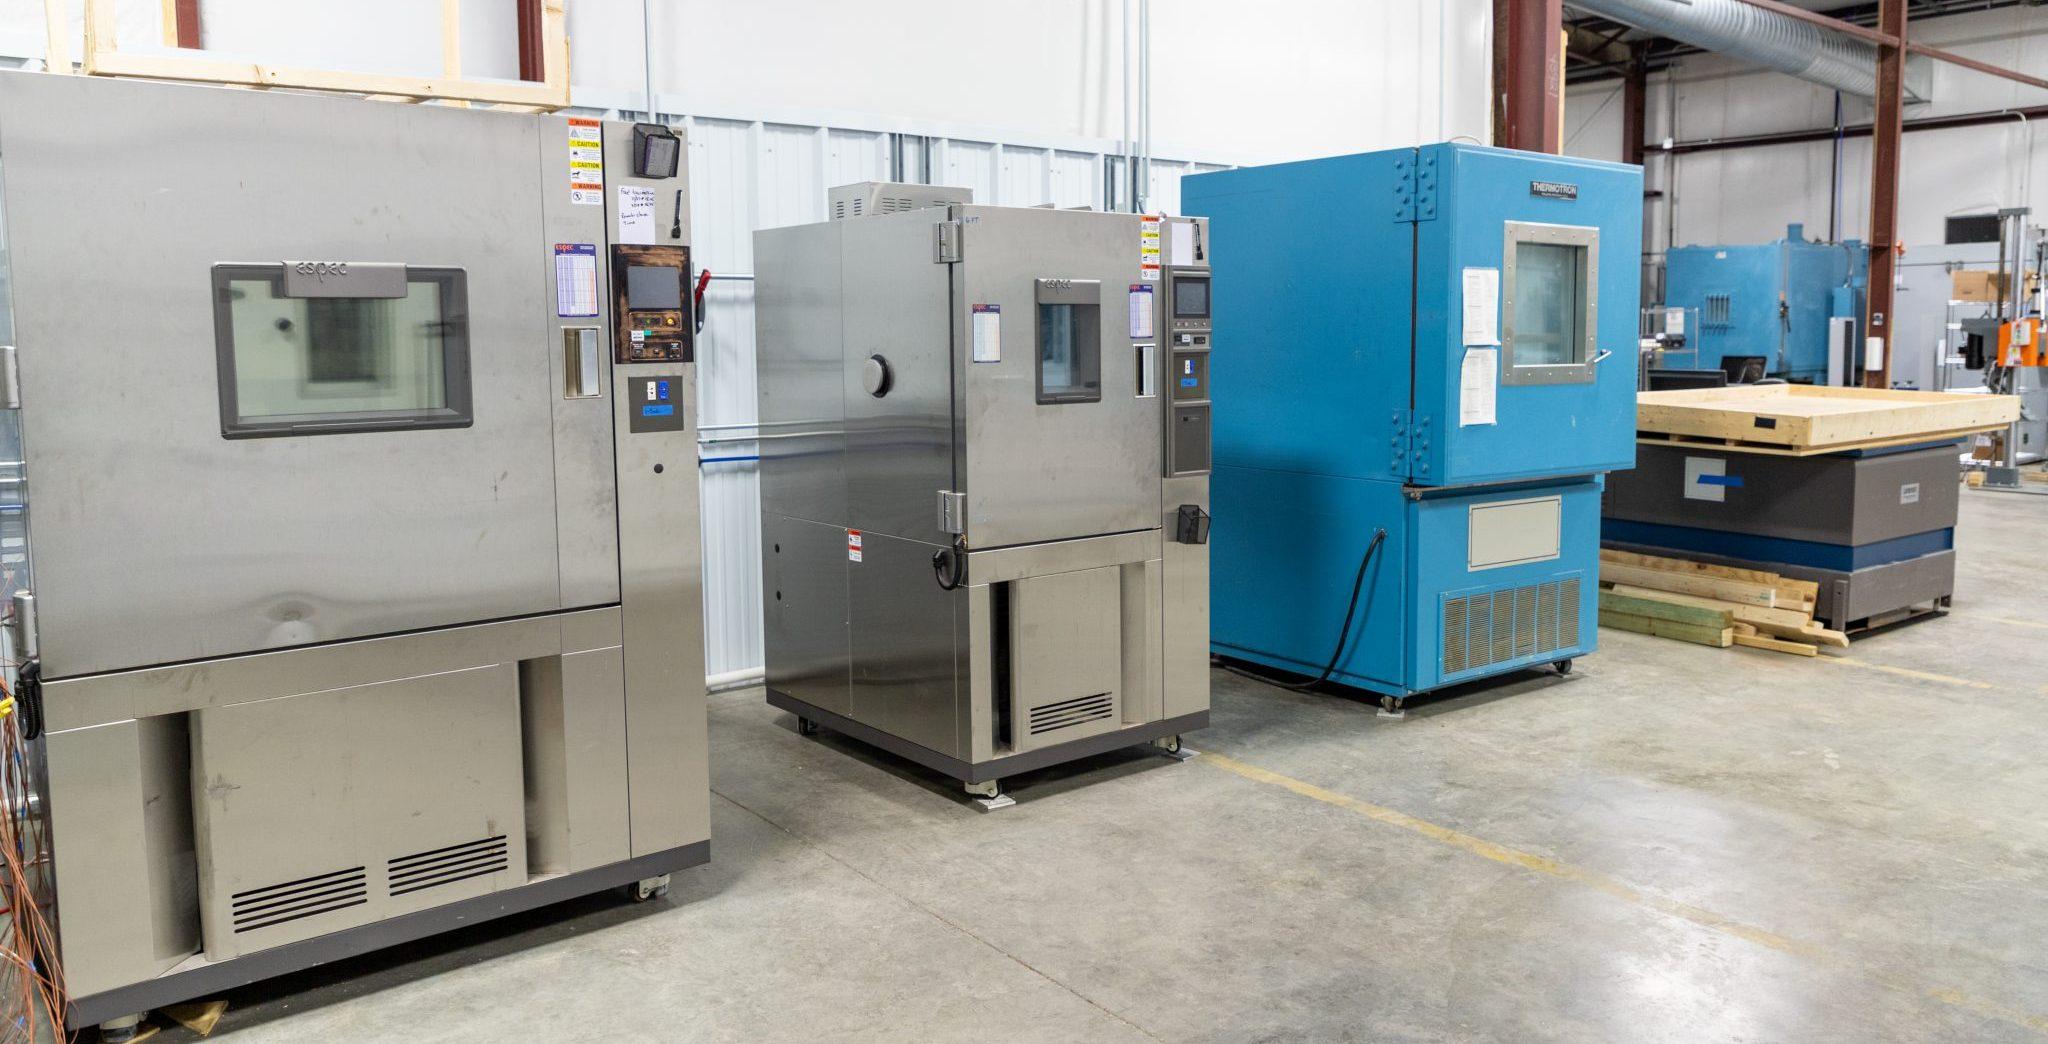 ASTM Testing Laboratory